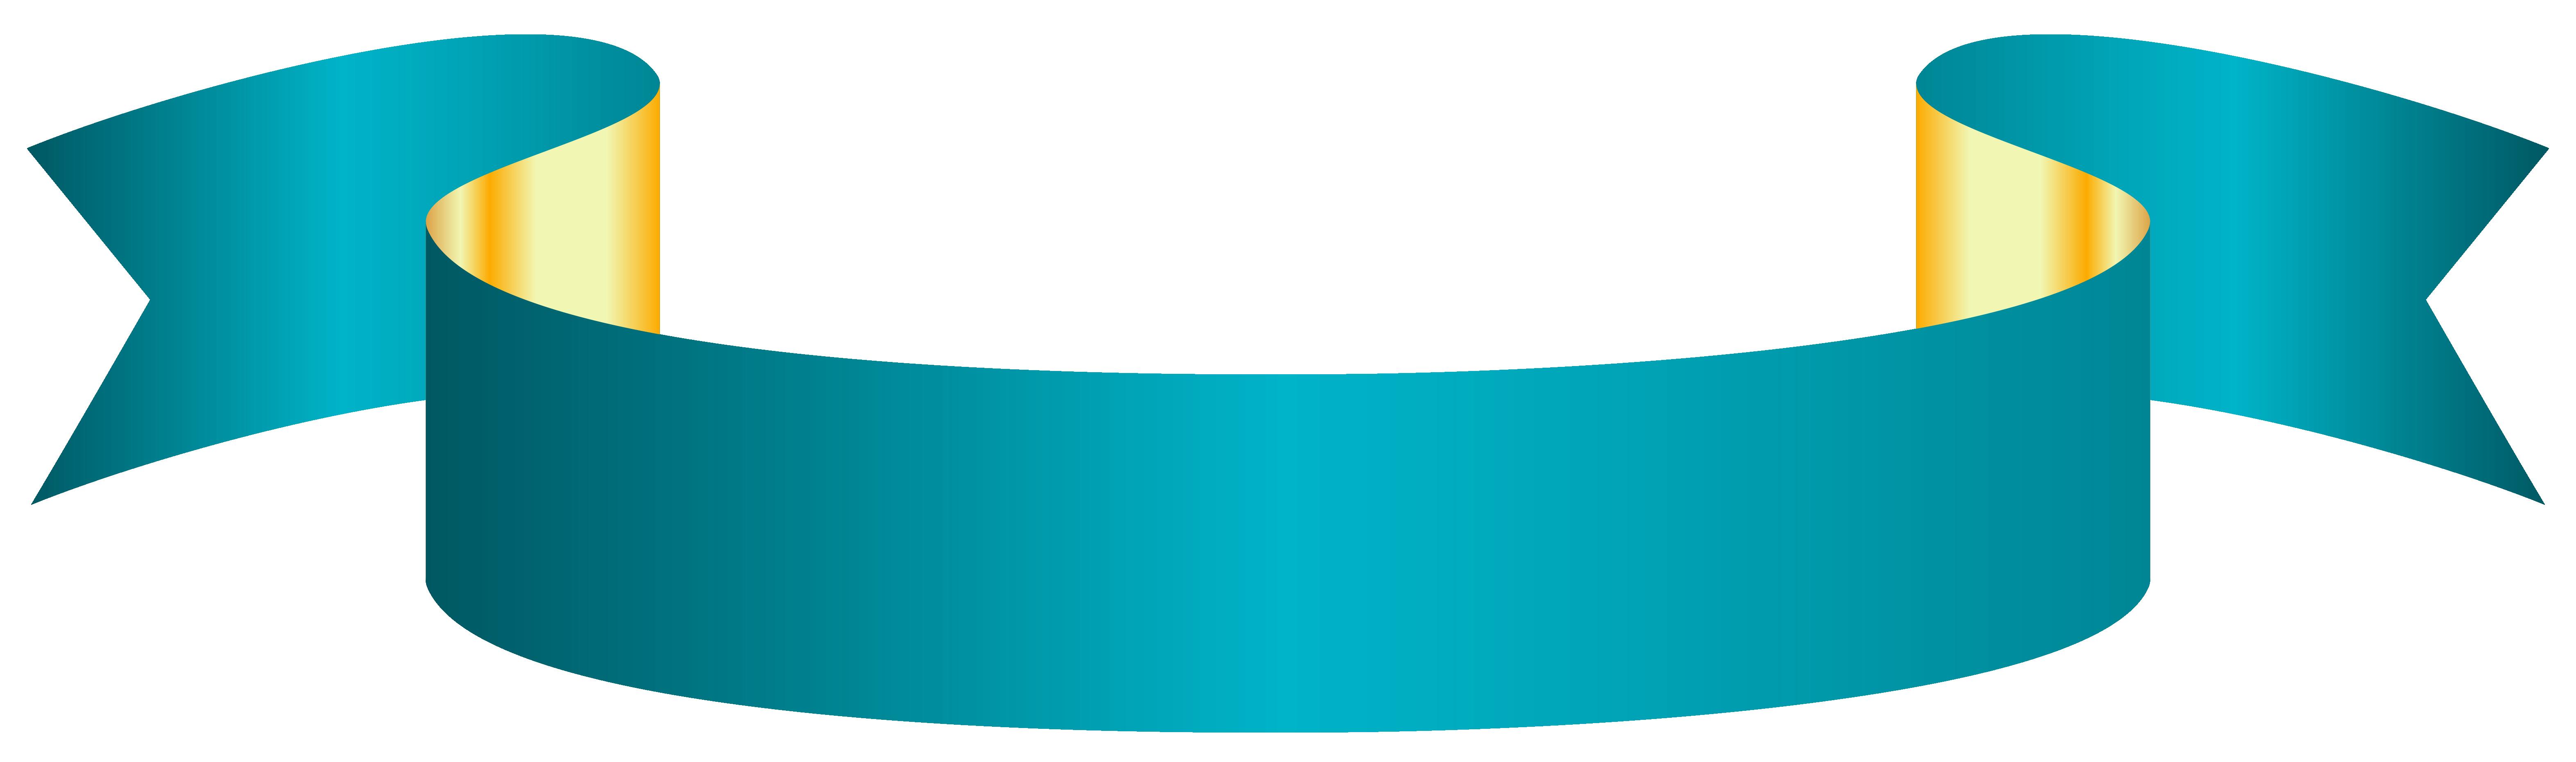 Blue Banner Transparent PNG Clip Art Image.